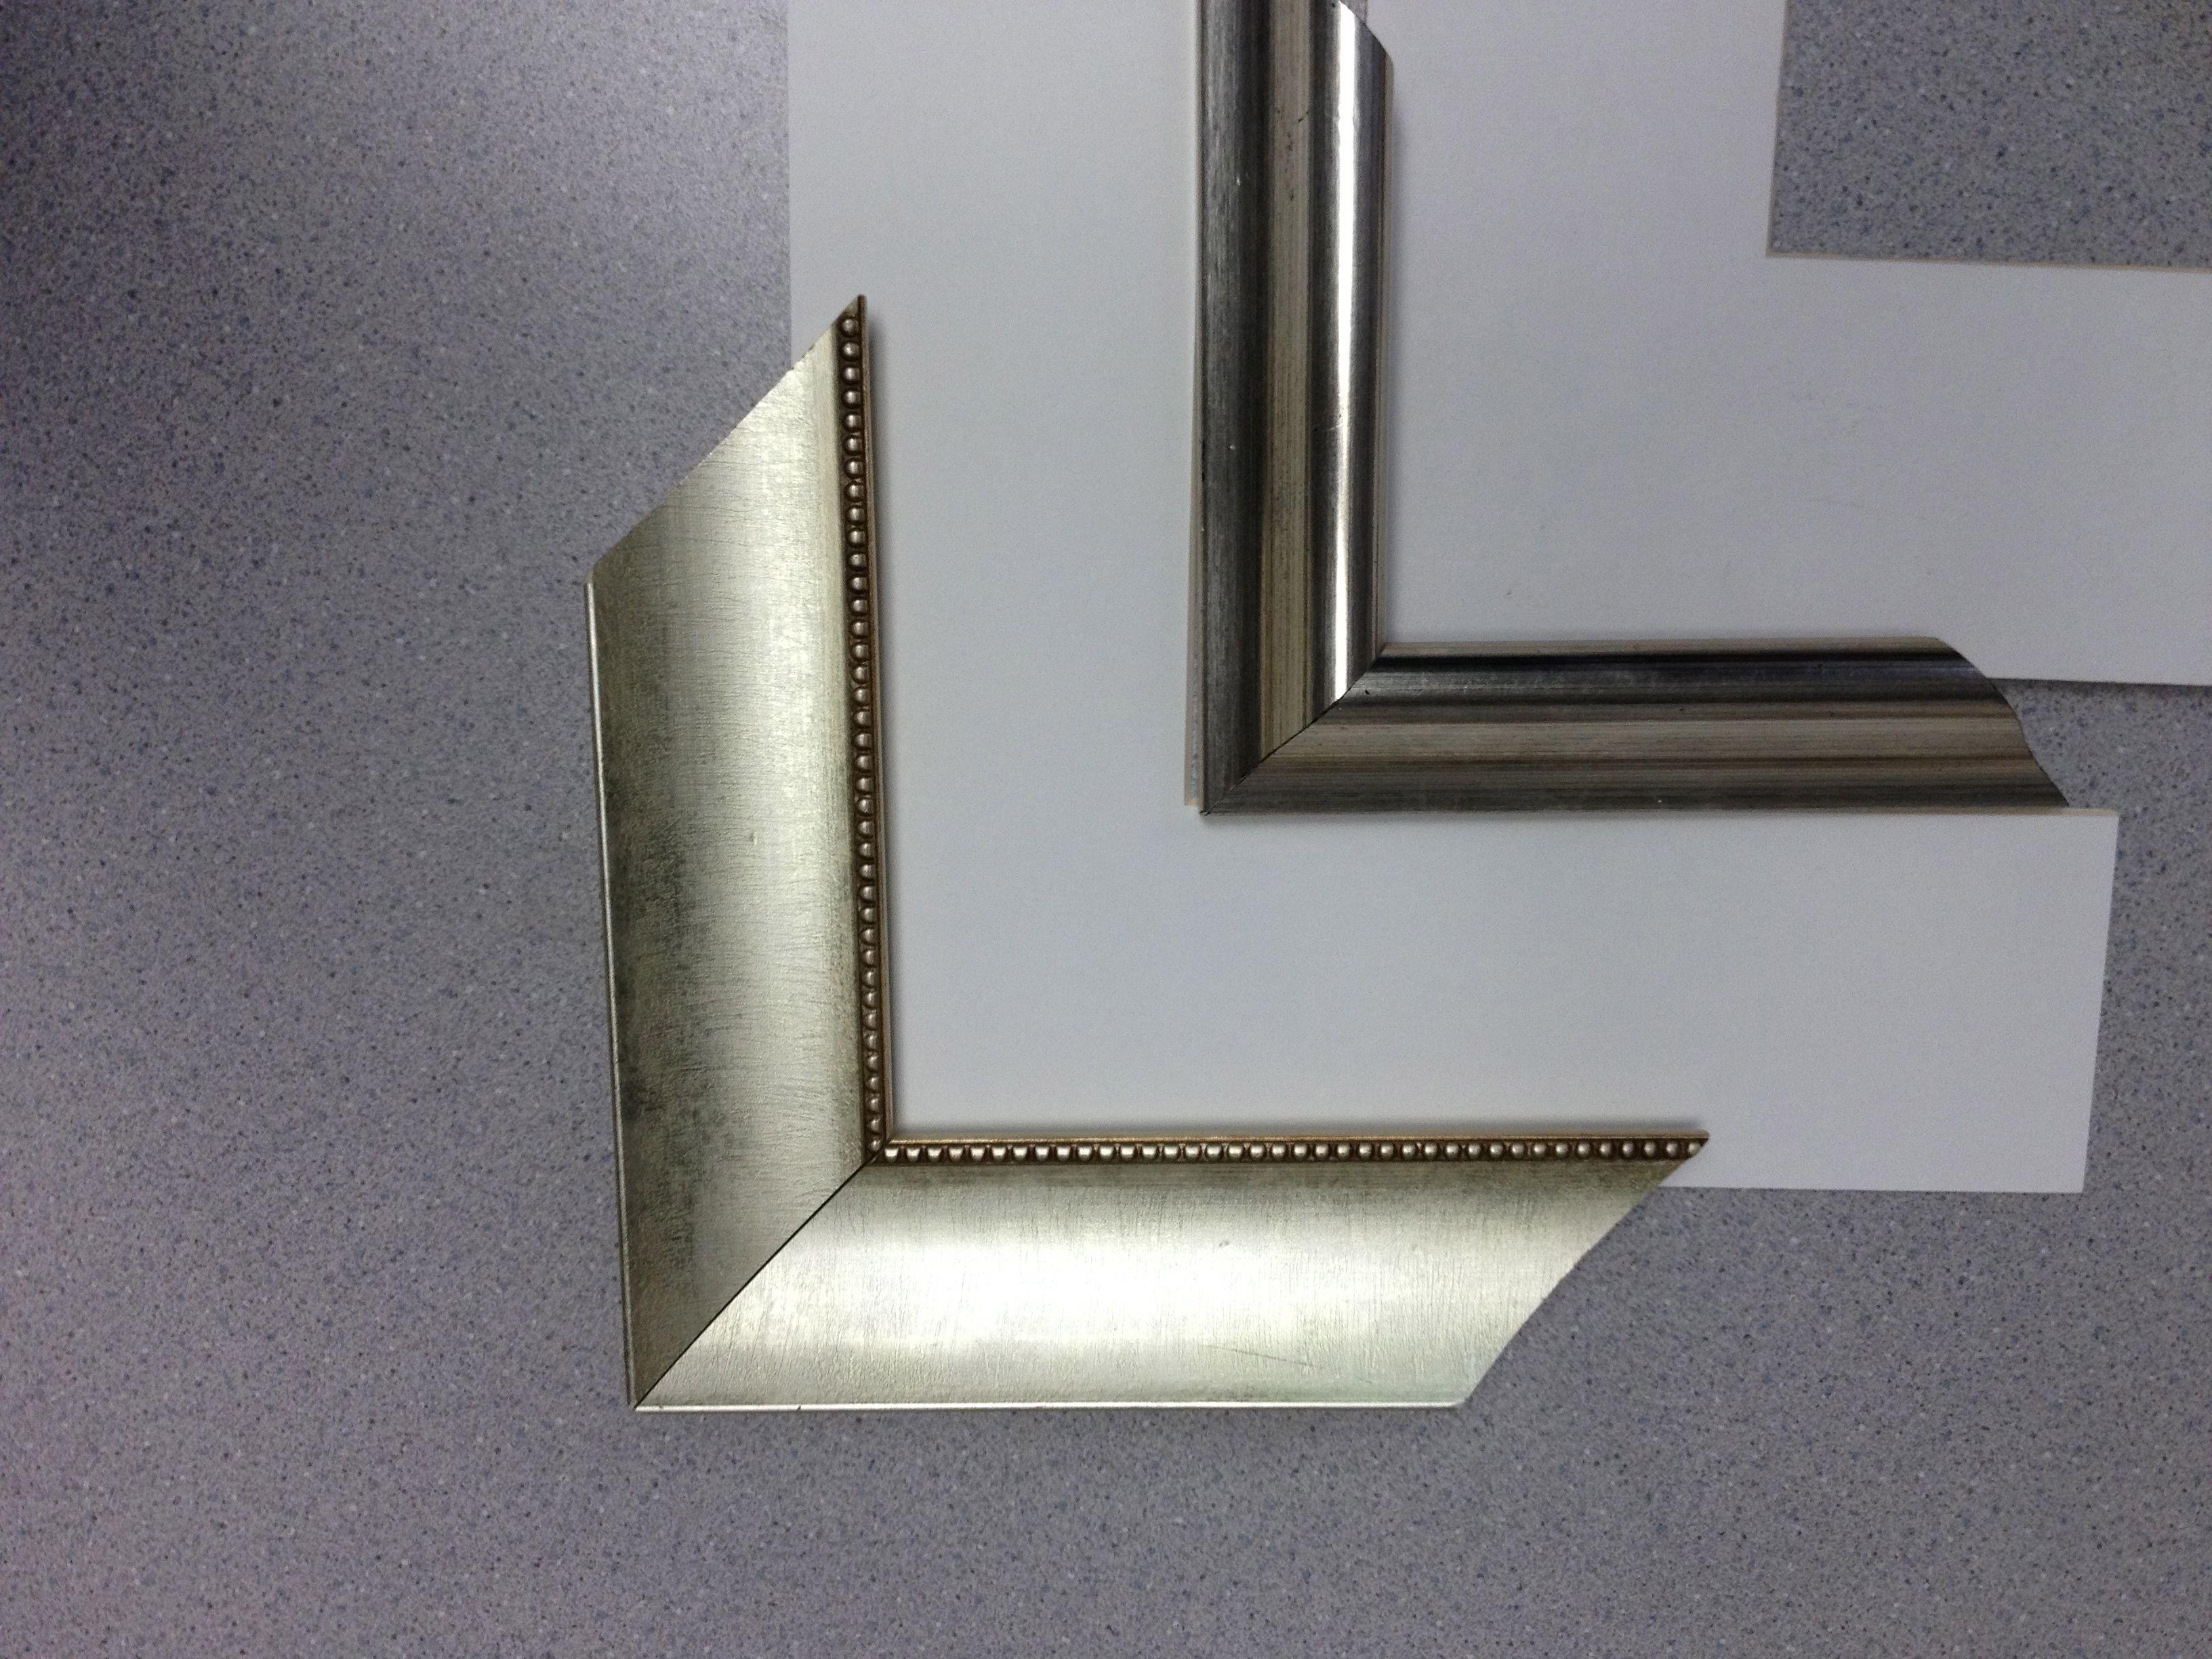 shades of silver